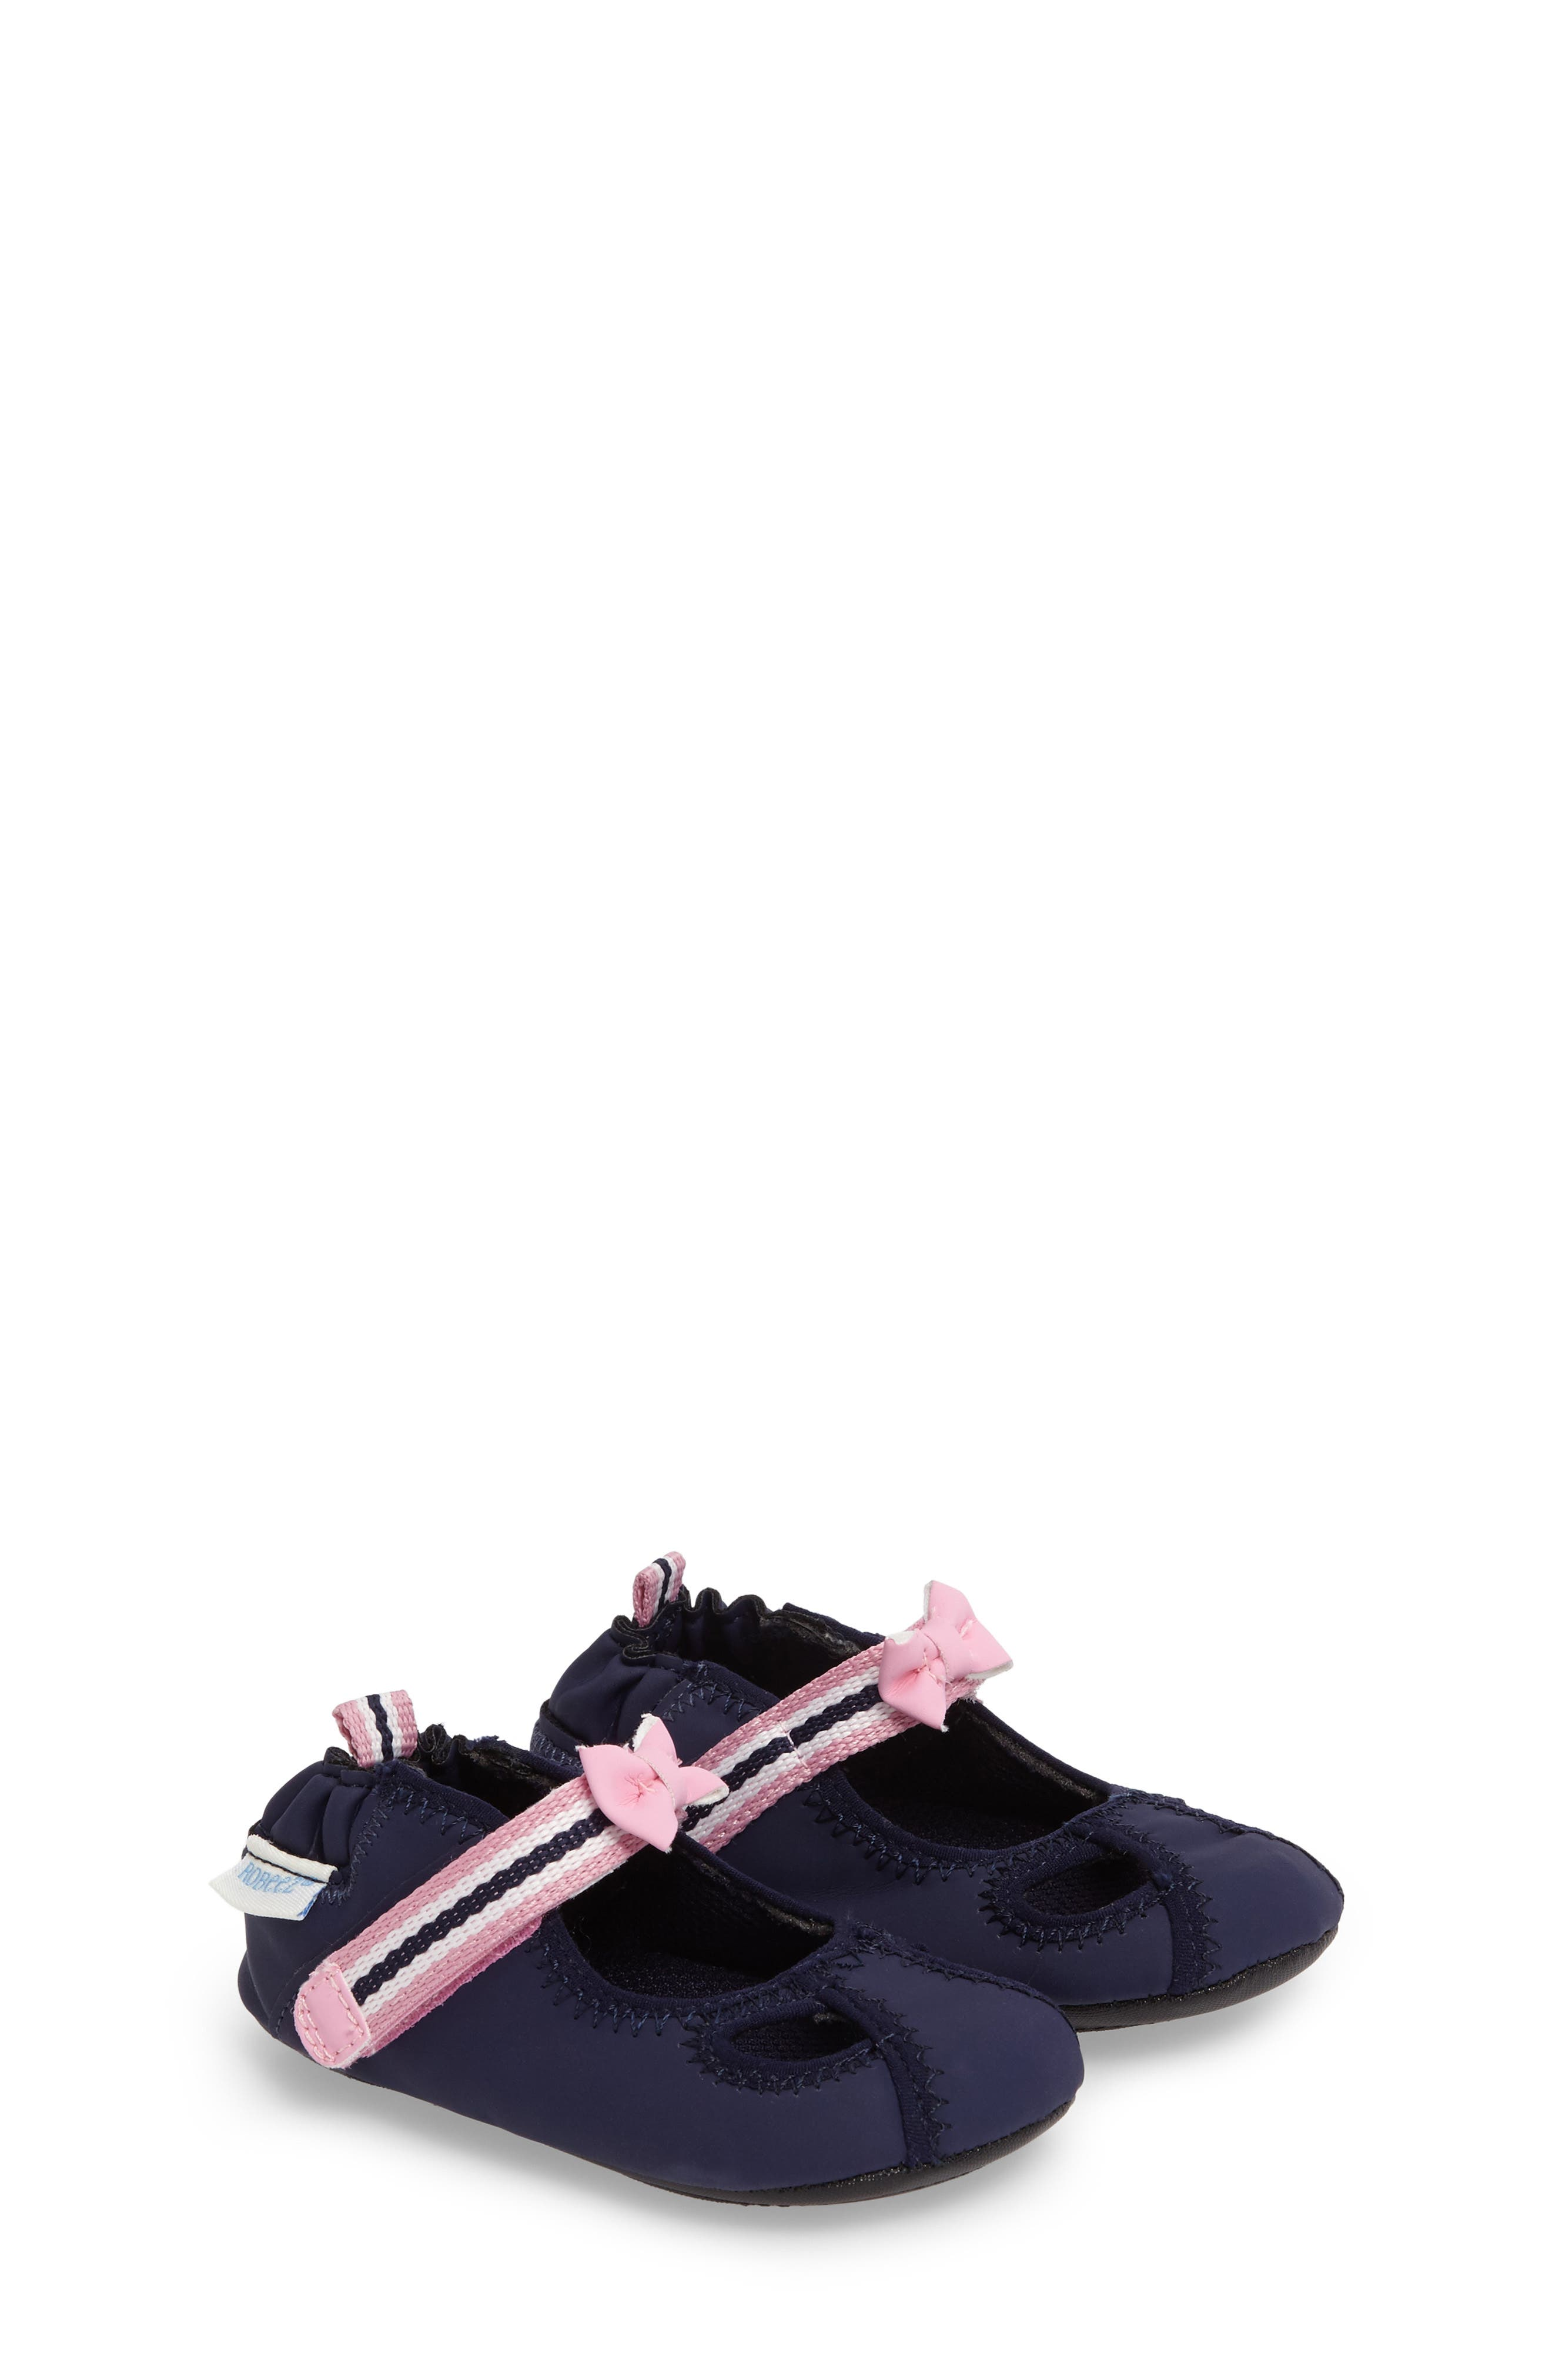 Wave Catcher Crib Shoe,                         Main,                         color, Navy